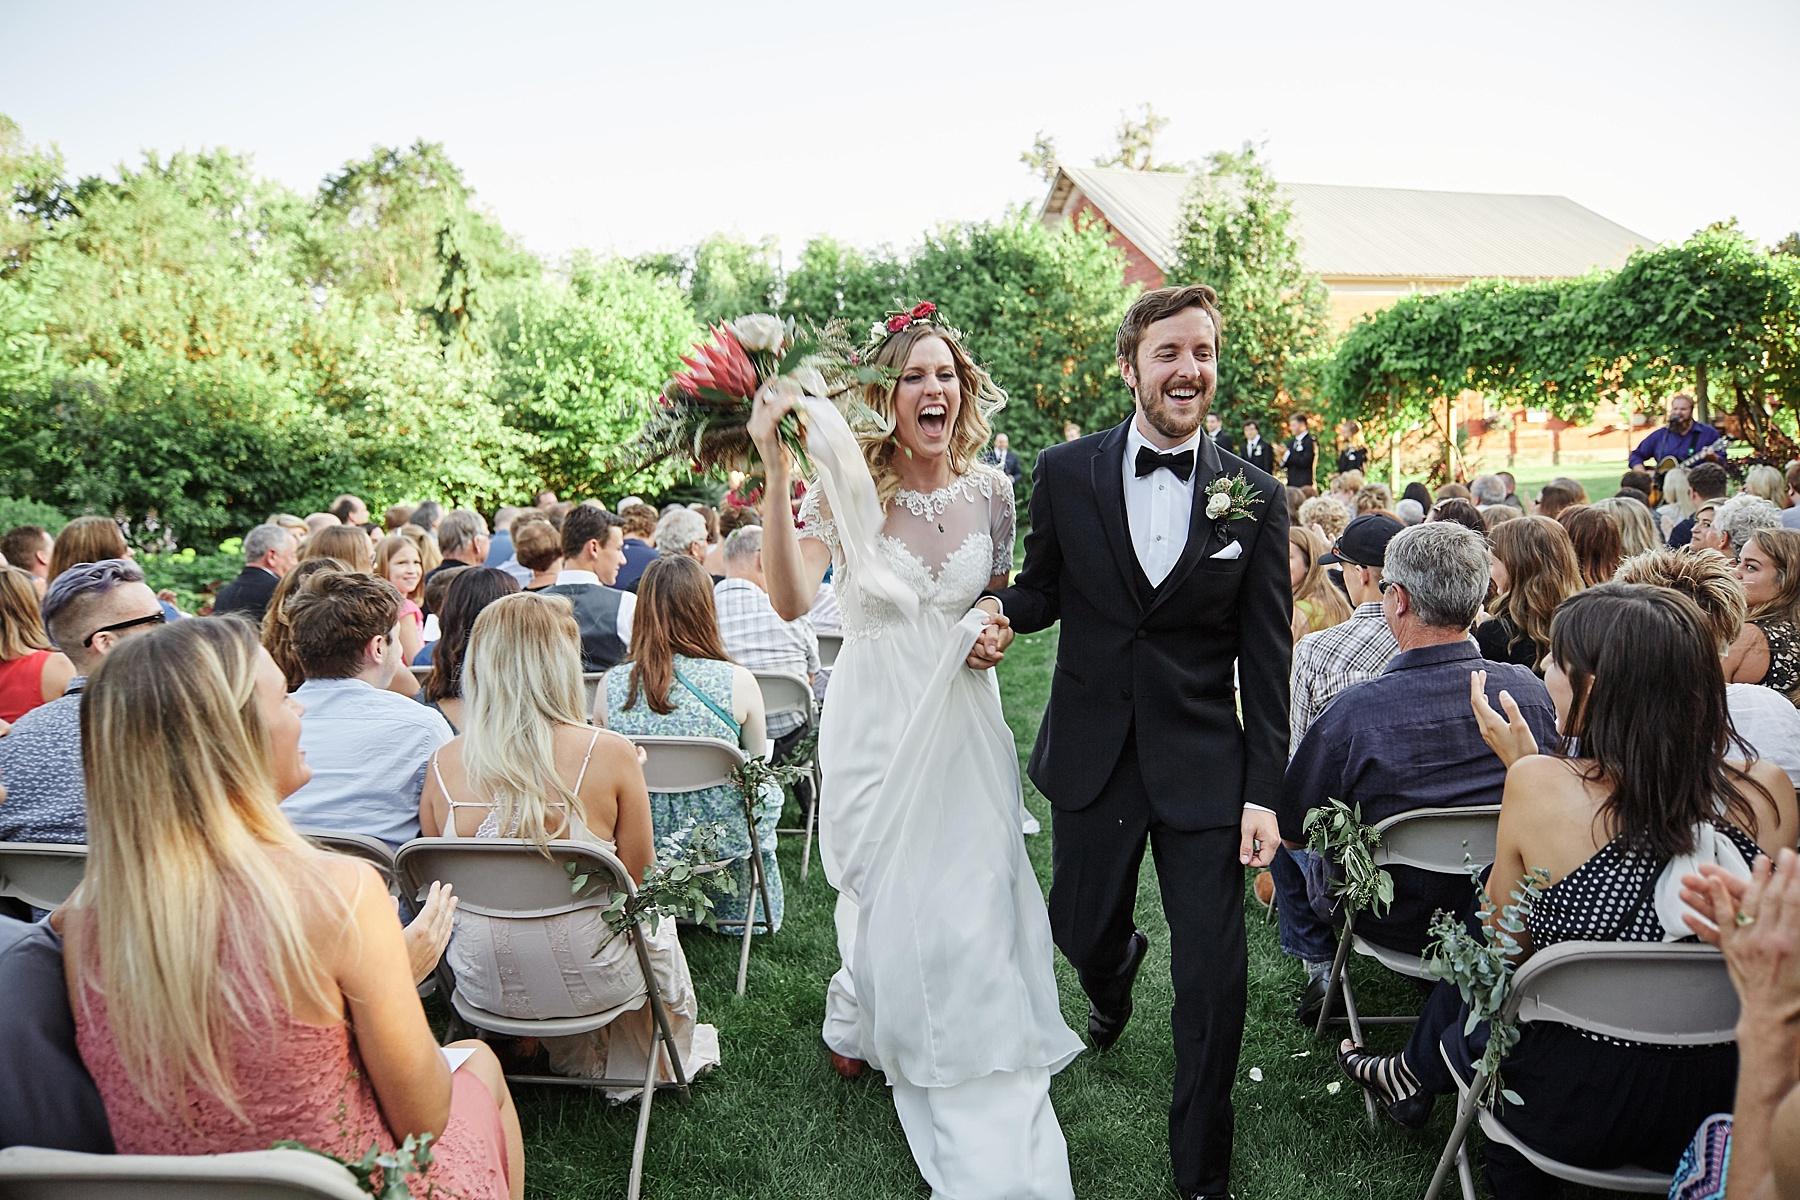 Fairhaven-Farm-South-Haven-Minnesota-Barn-Outdoor-Wedding-Josh-Kailey_1010.jpg